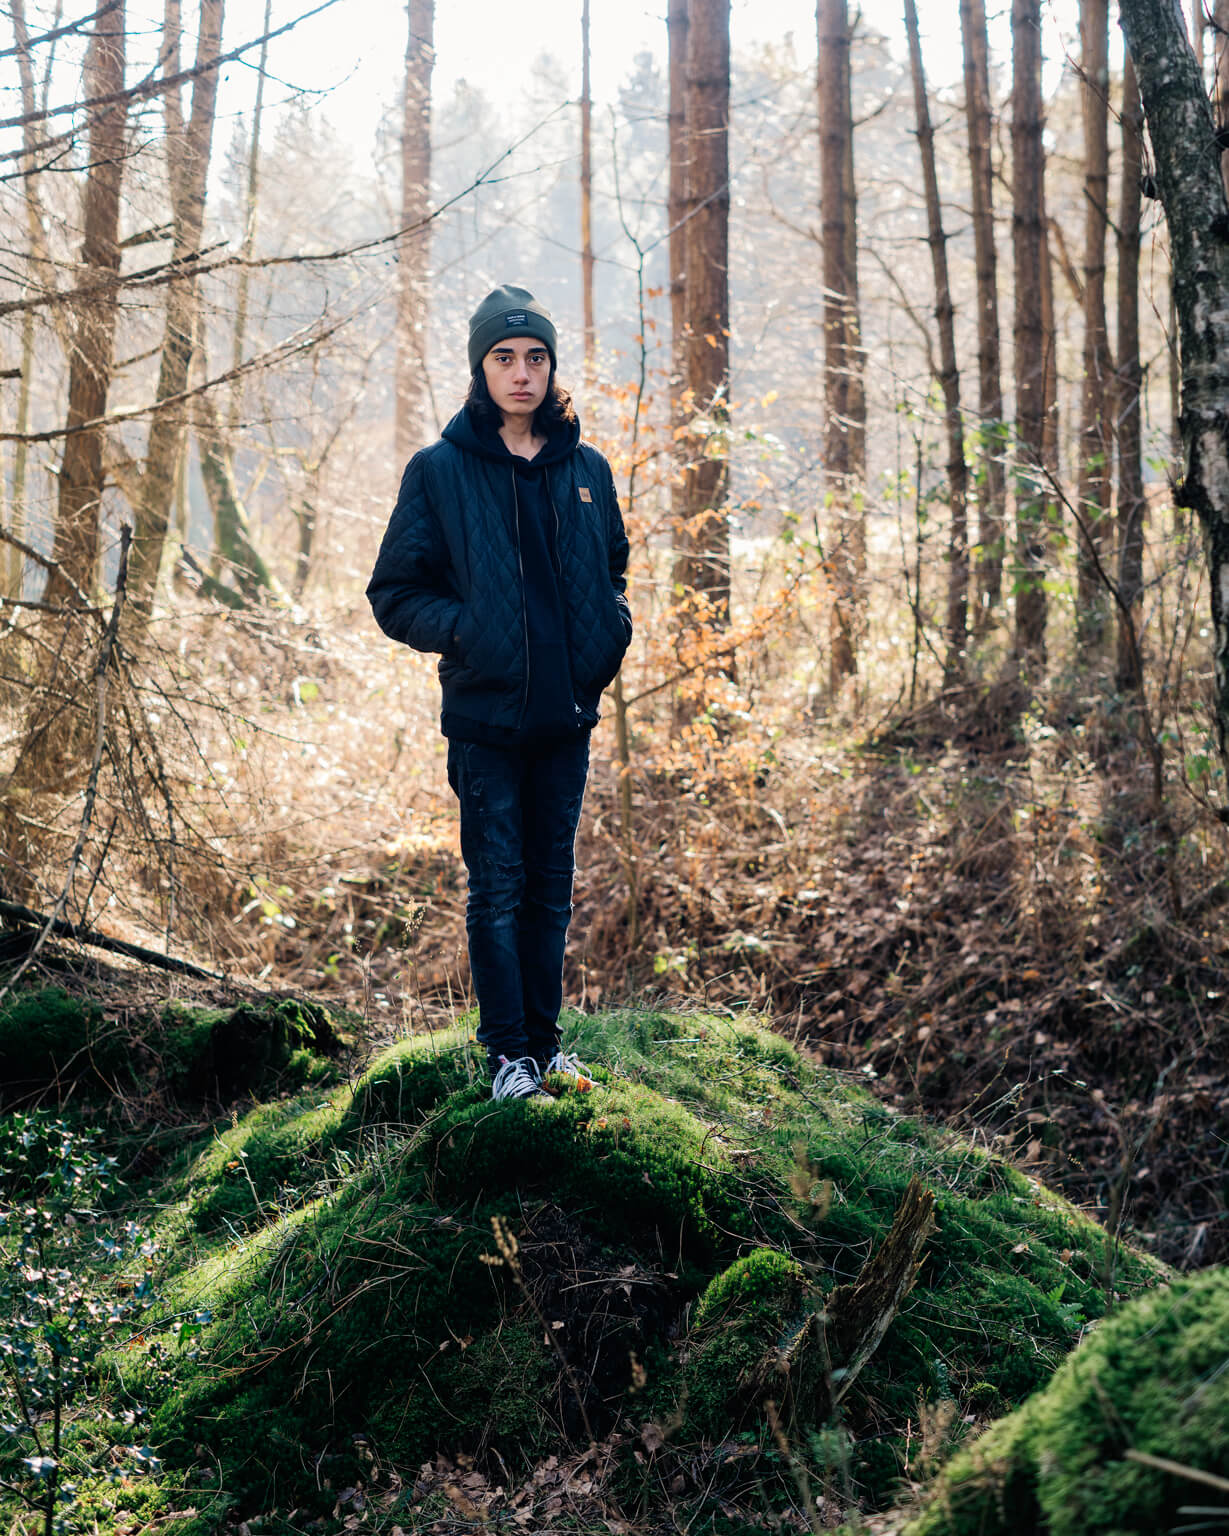 20180218_teens_woodlandwonderland_a_095